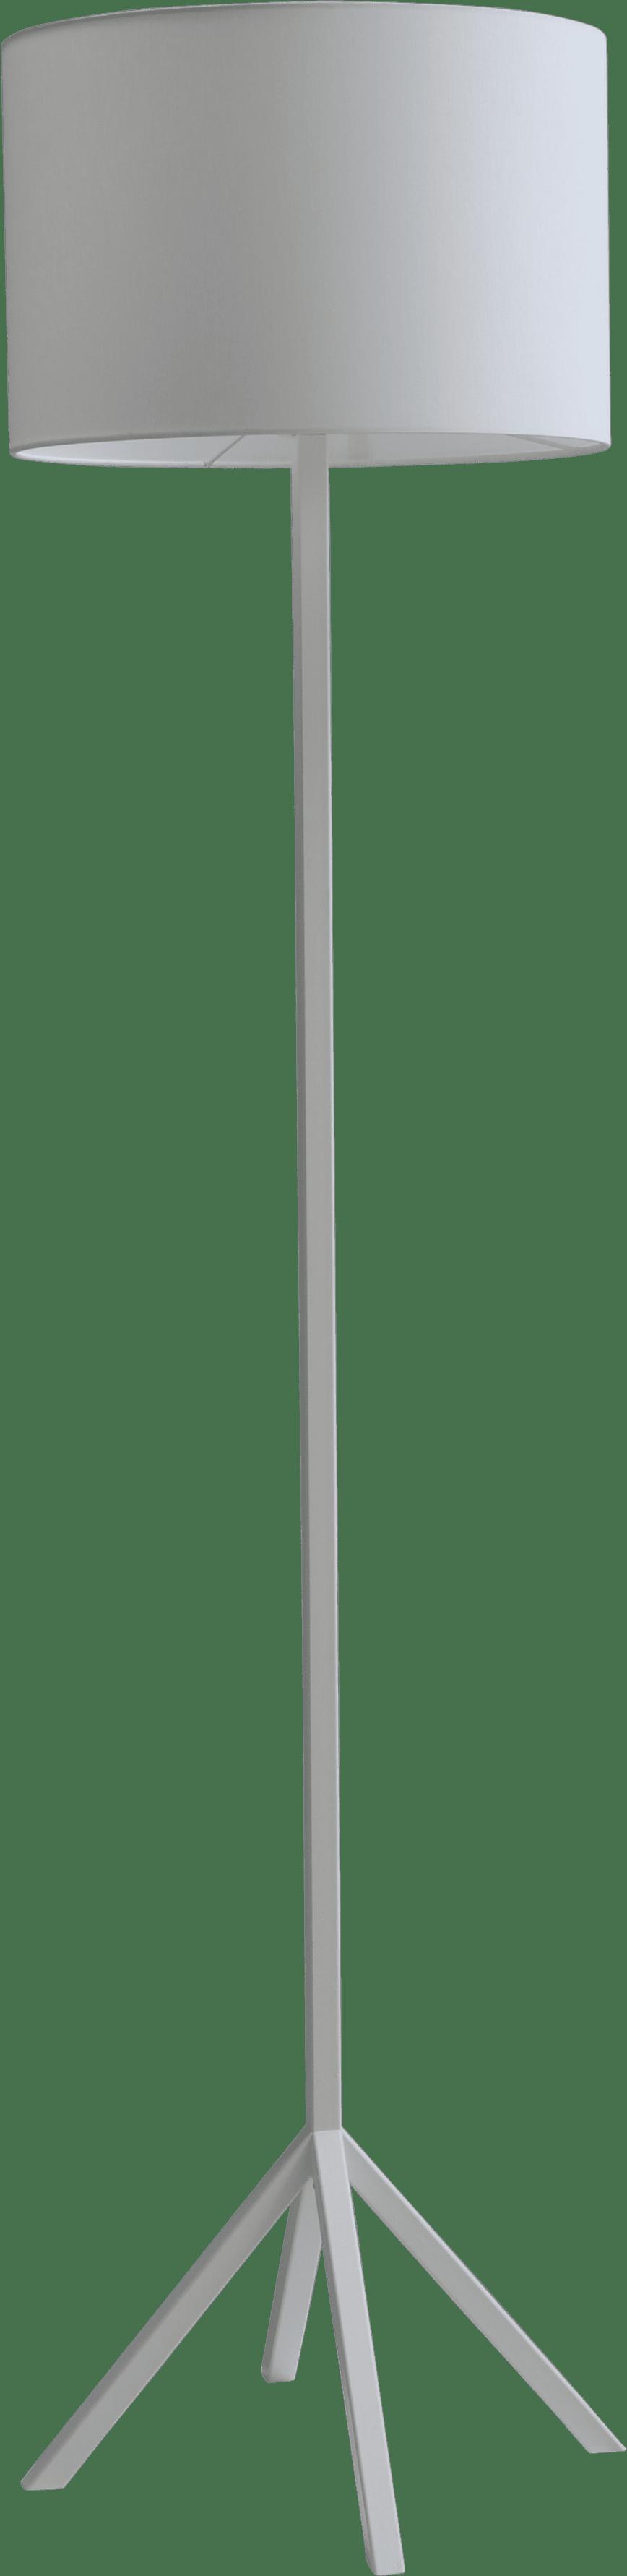 Cross VL CROSS PYRAMID WHITE STRUCT. H.154CM